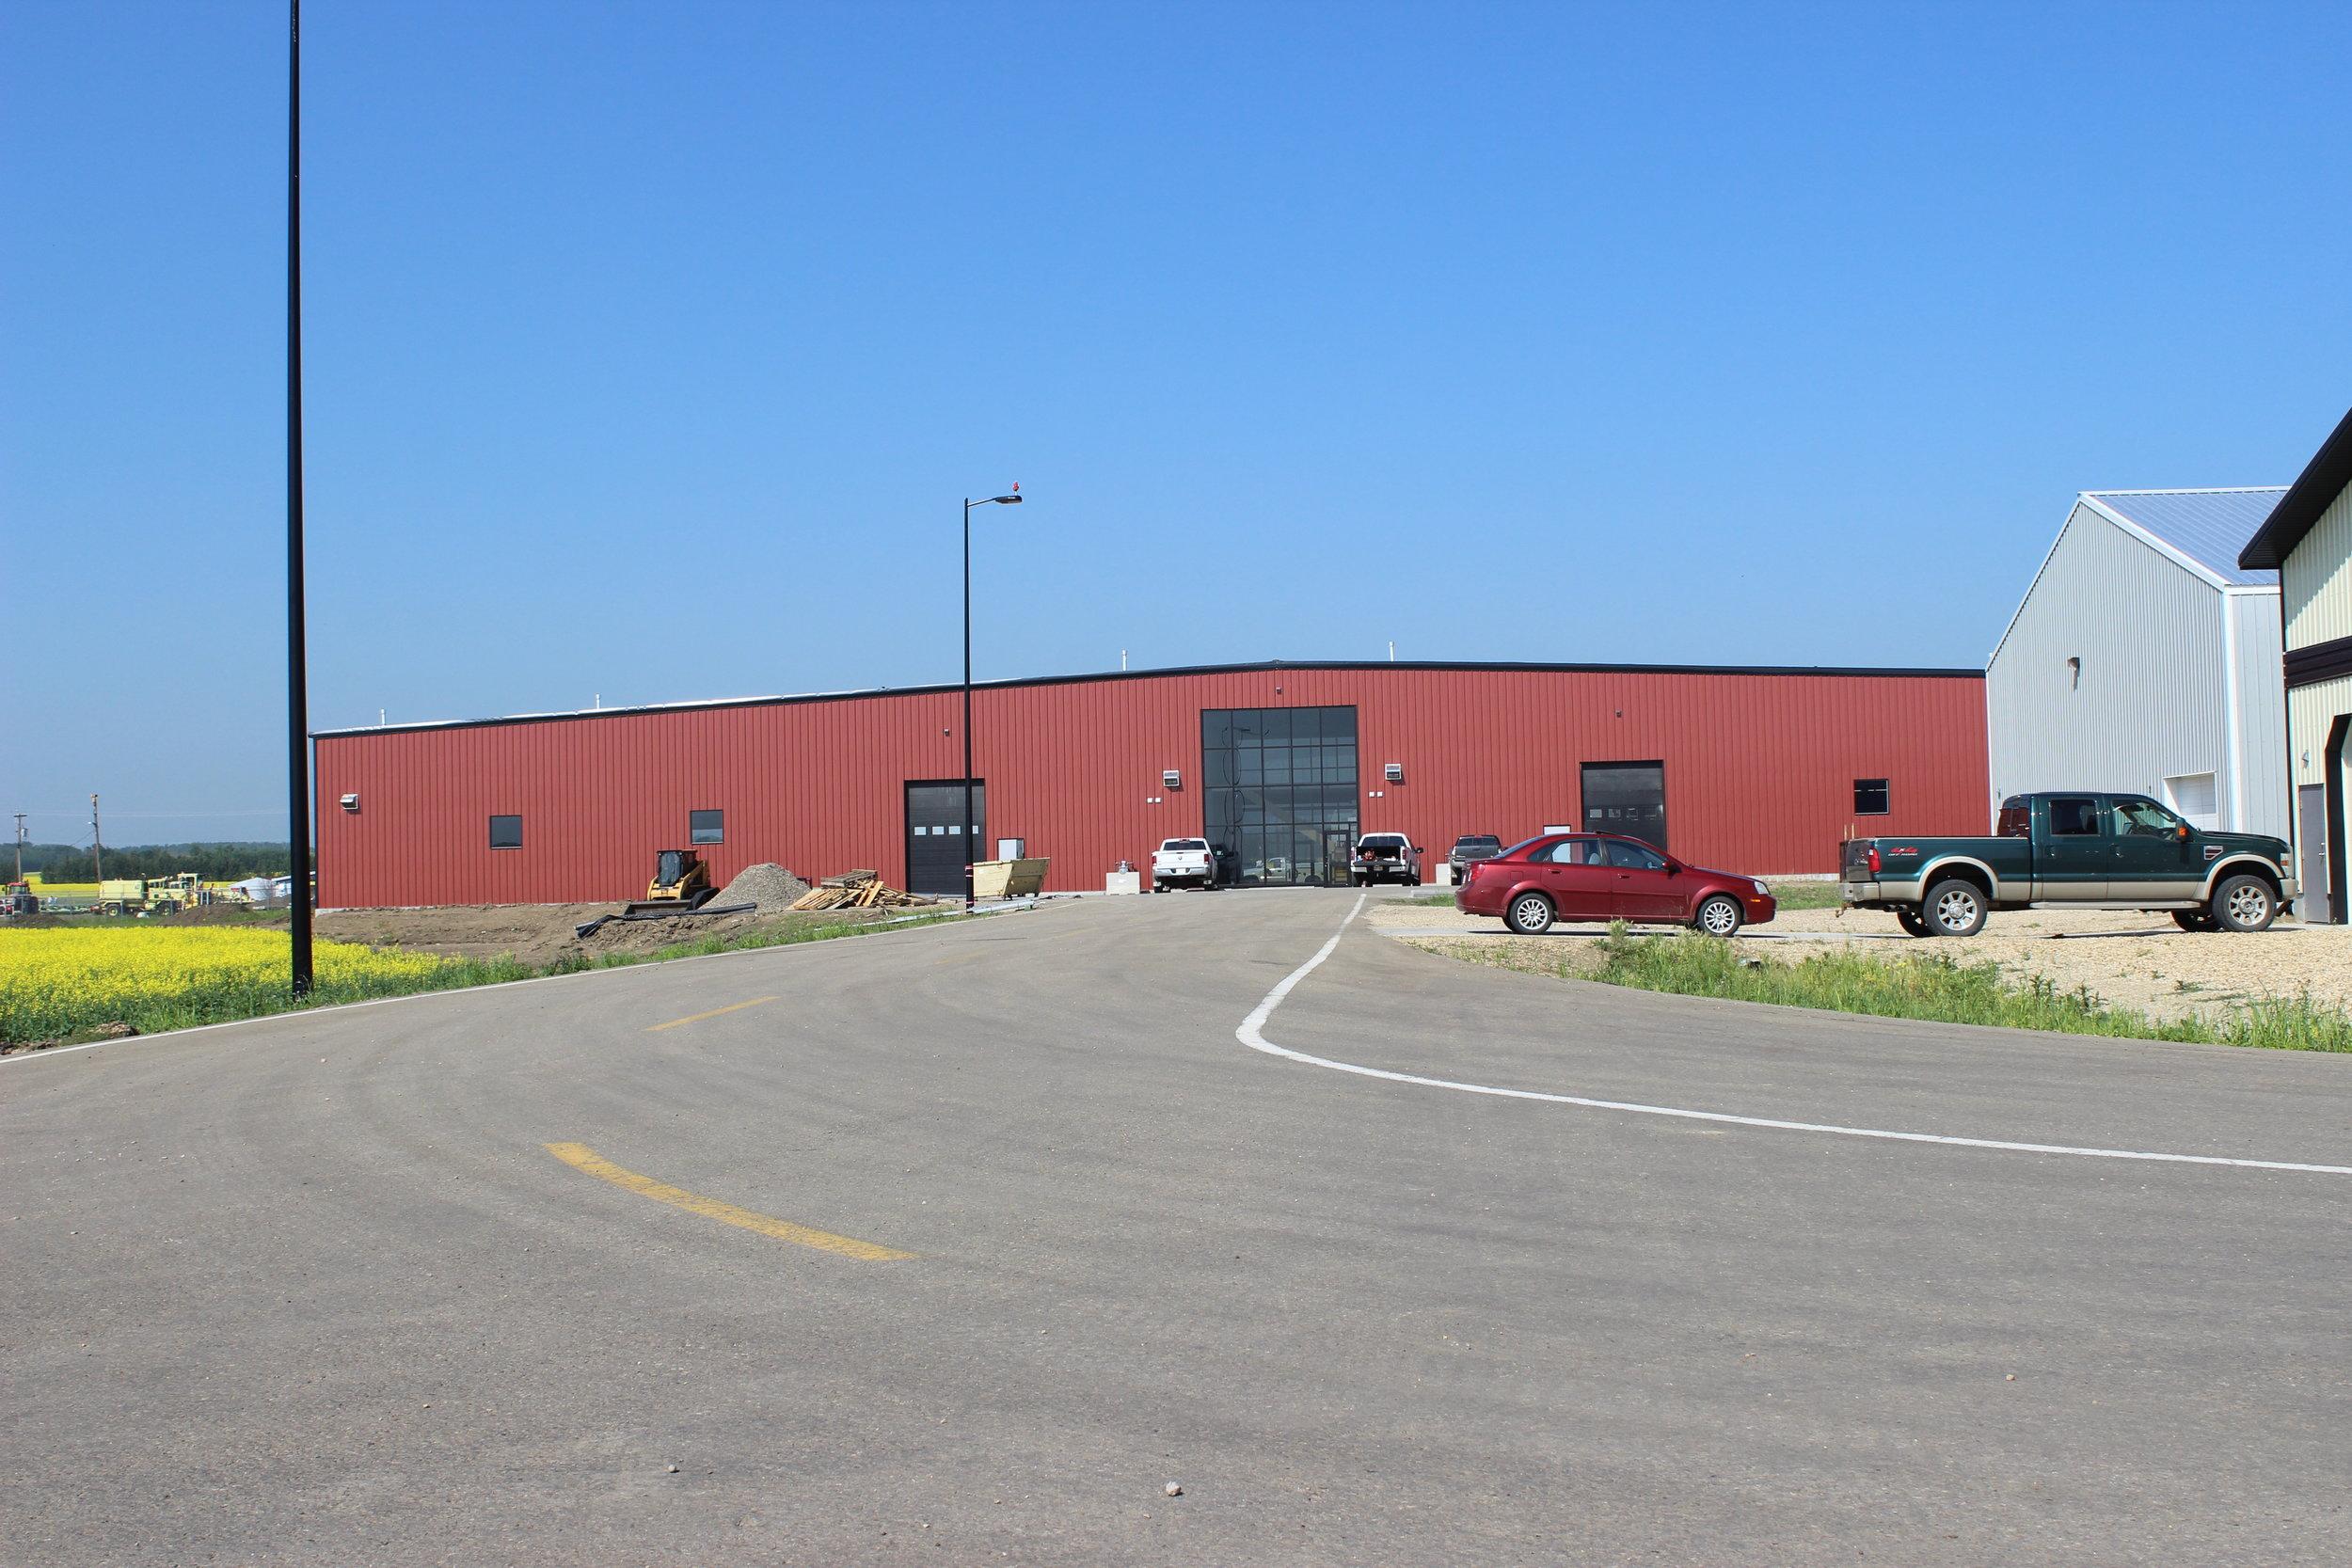 Villeneuve Aircraft Hanger  Located at Villeneuve AB.  An Aricraft Hanger for a private client.